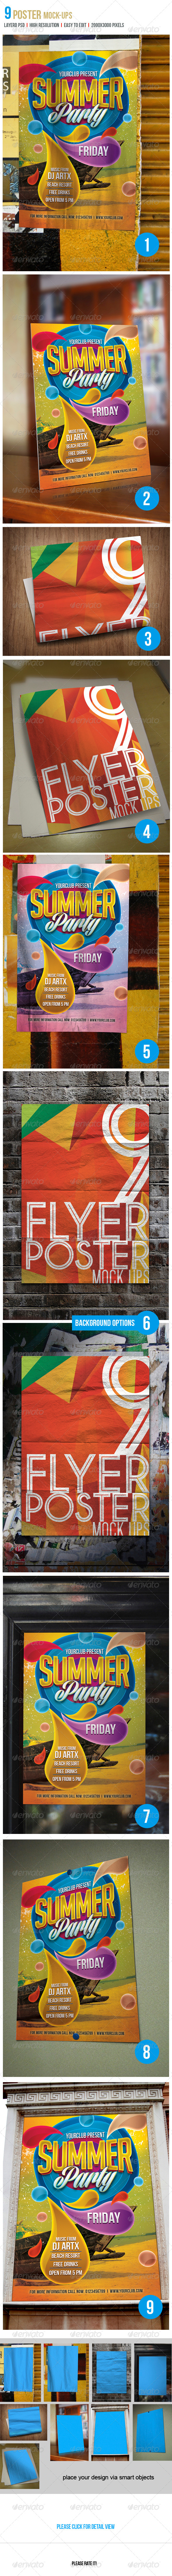 Poster Mock-Up Set - Product Mock-Ups Graphics